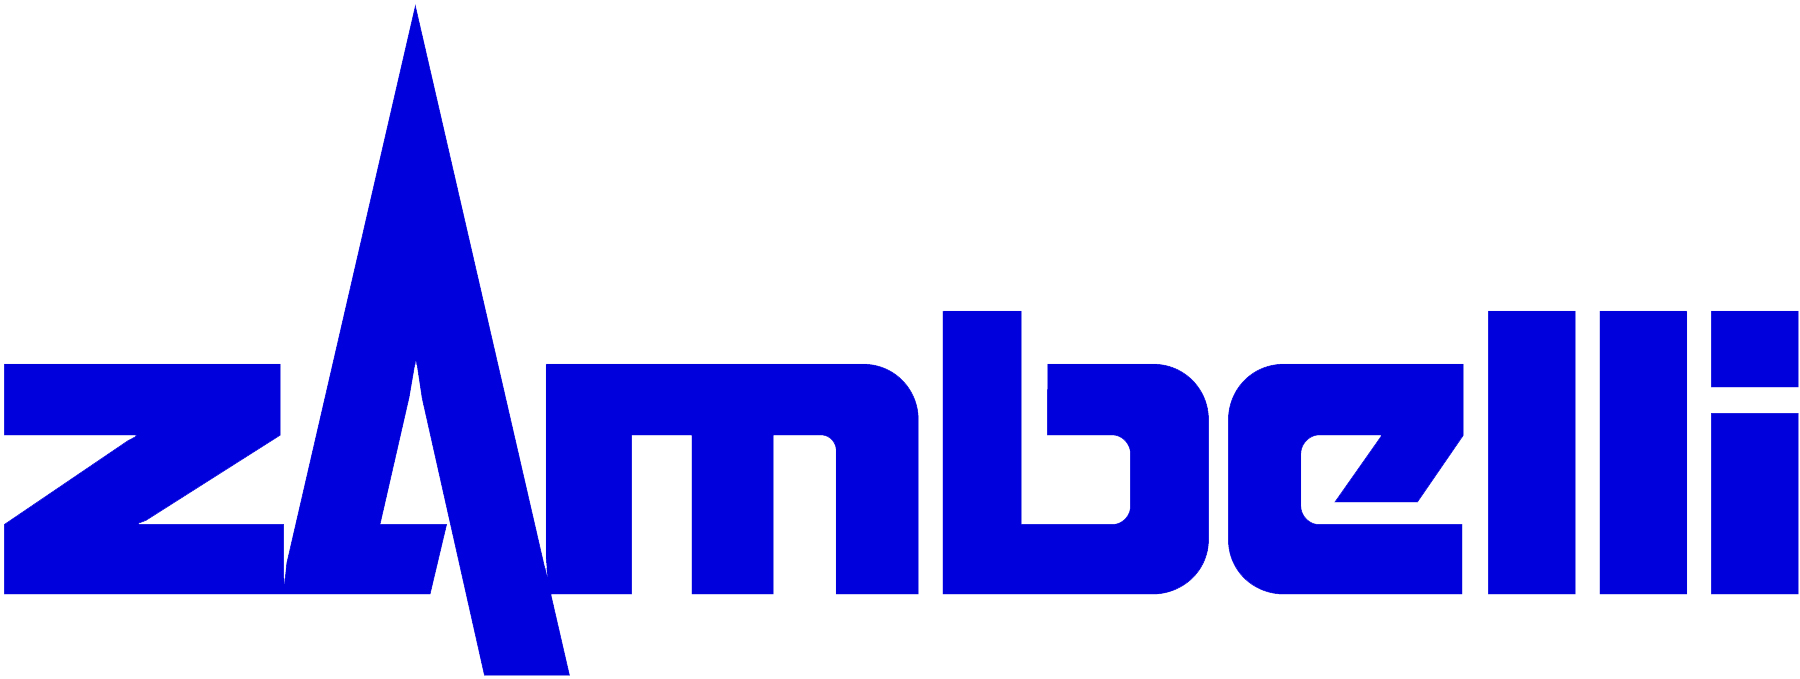 Zambelli_Logo copy